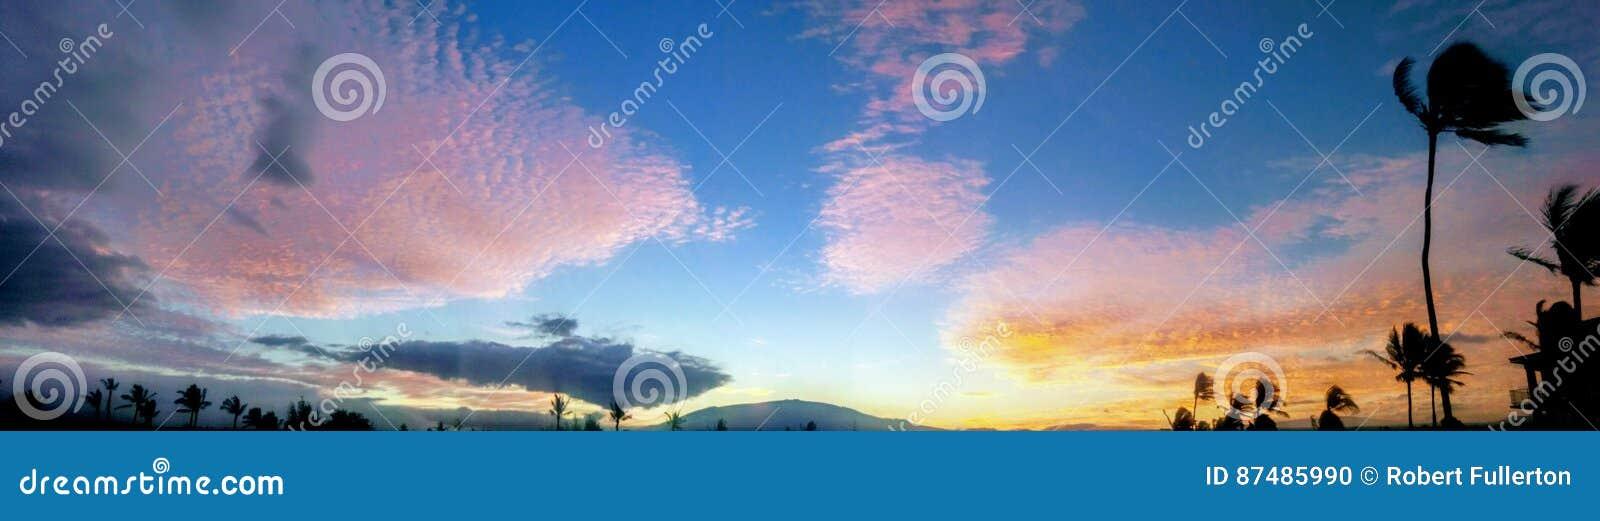 Zonsopgang cloudscape onder Mauna Kea zoals die van Waikaloa wordt gezien